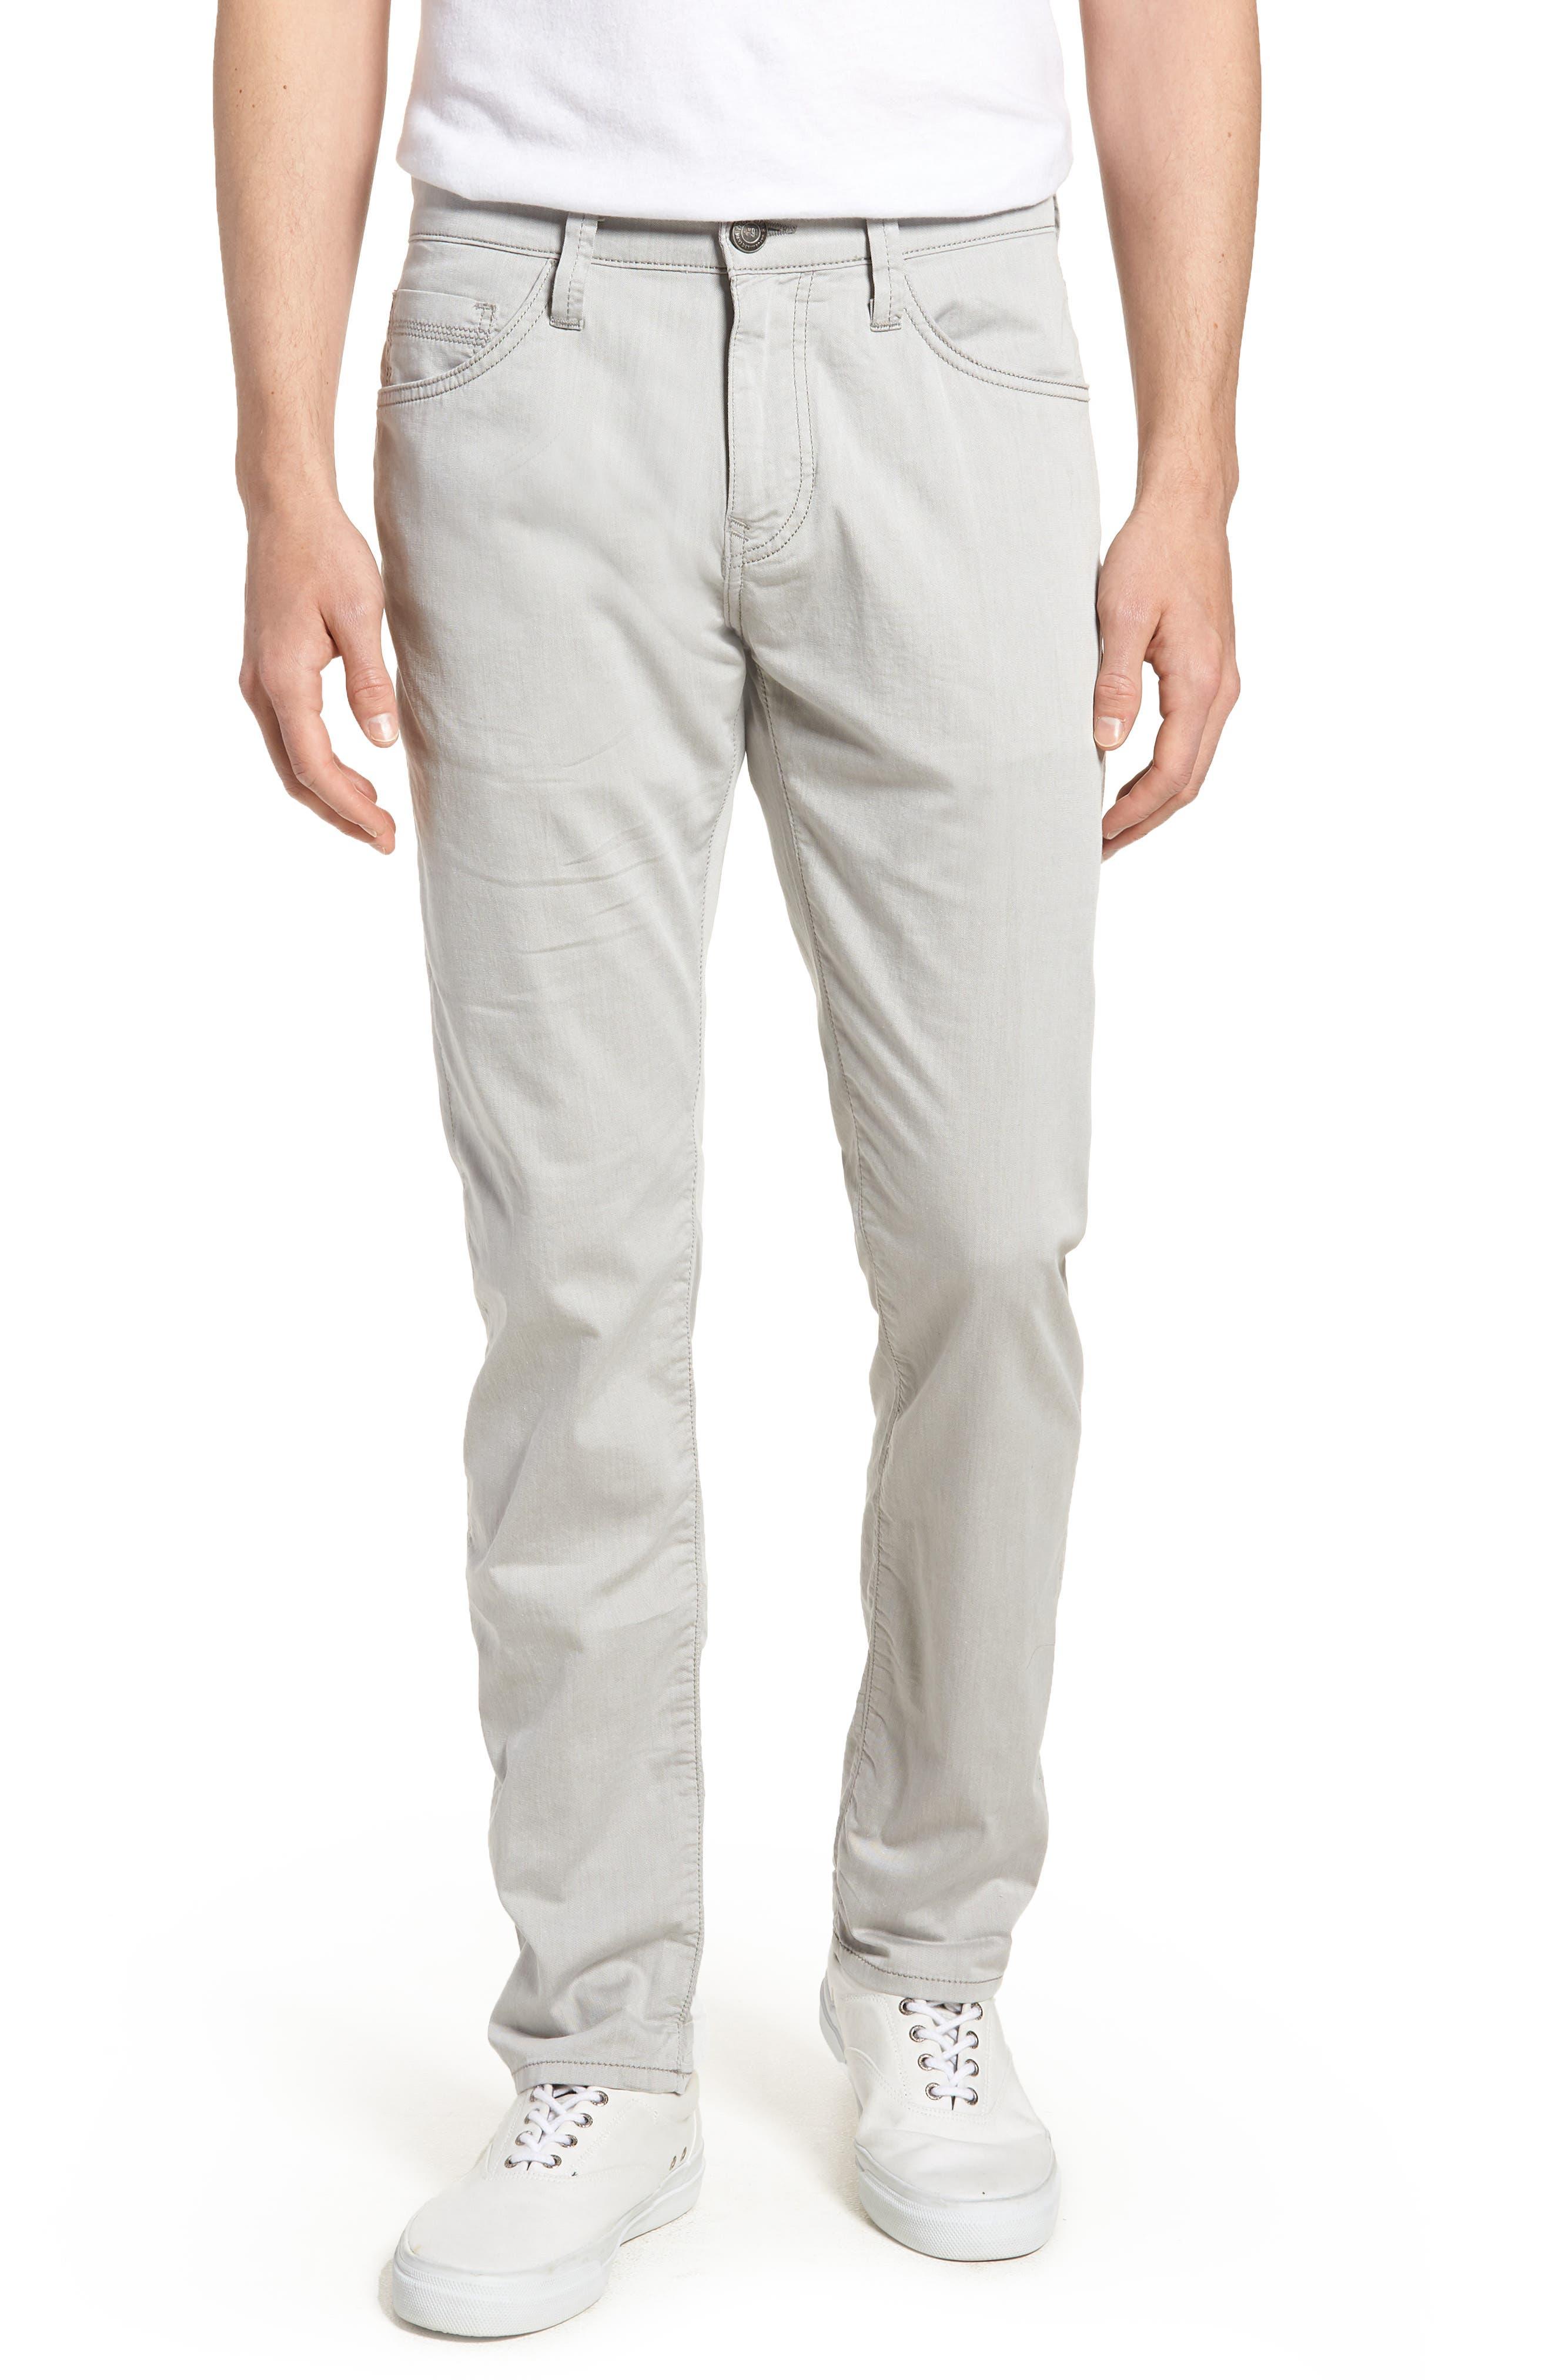 Jake Slim Fit Jeans,                             Main thumbnail 1, color,                             Latte Reversed